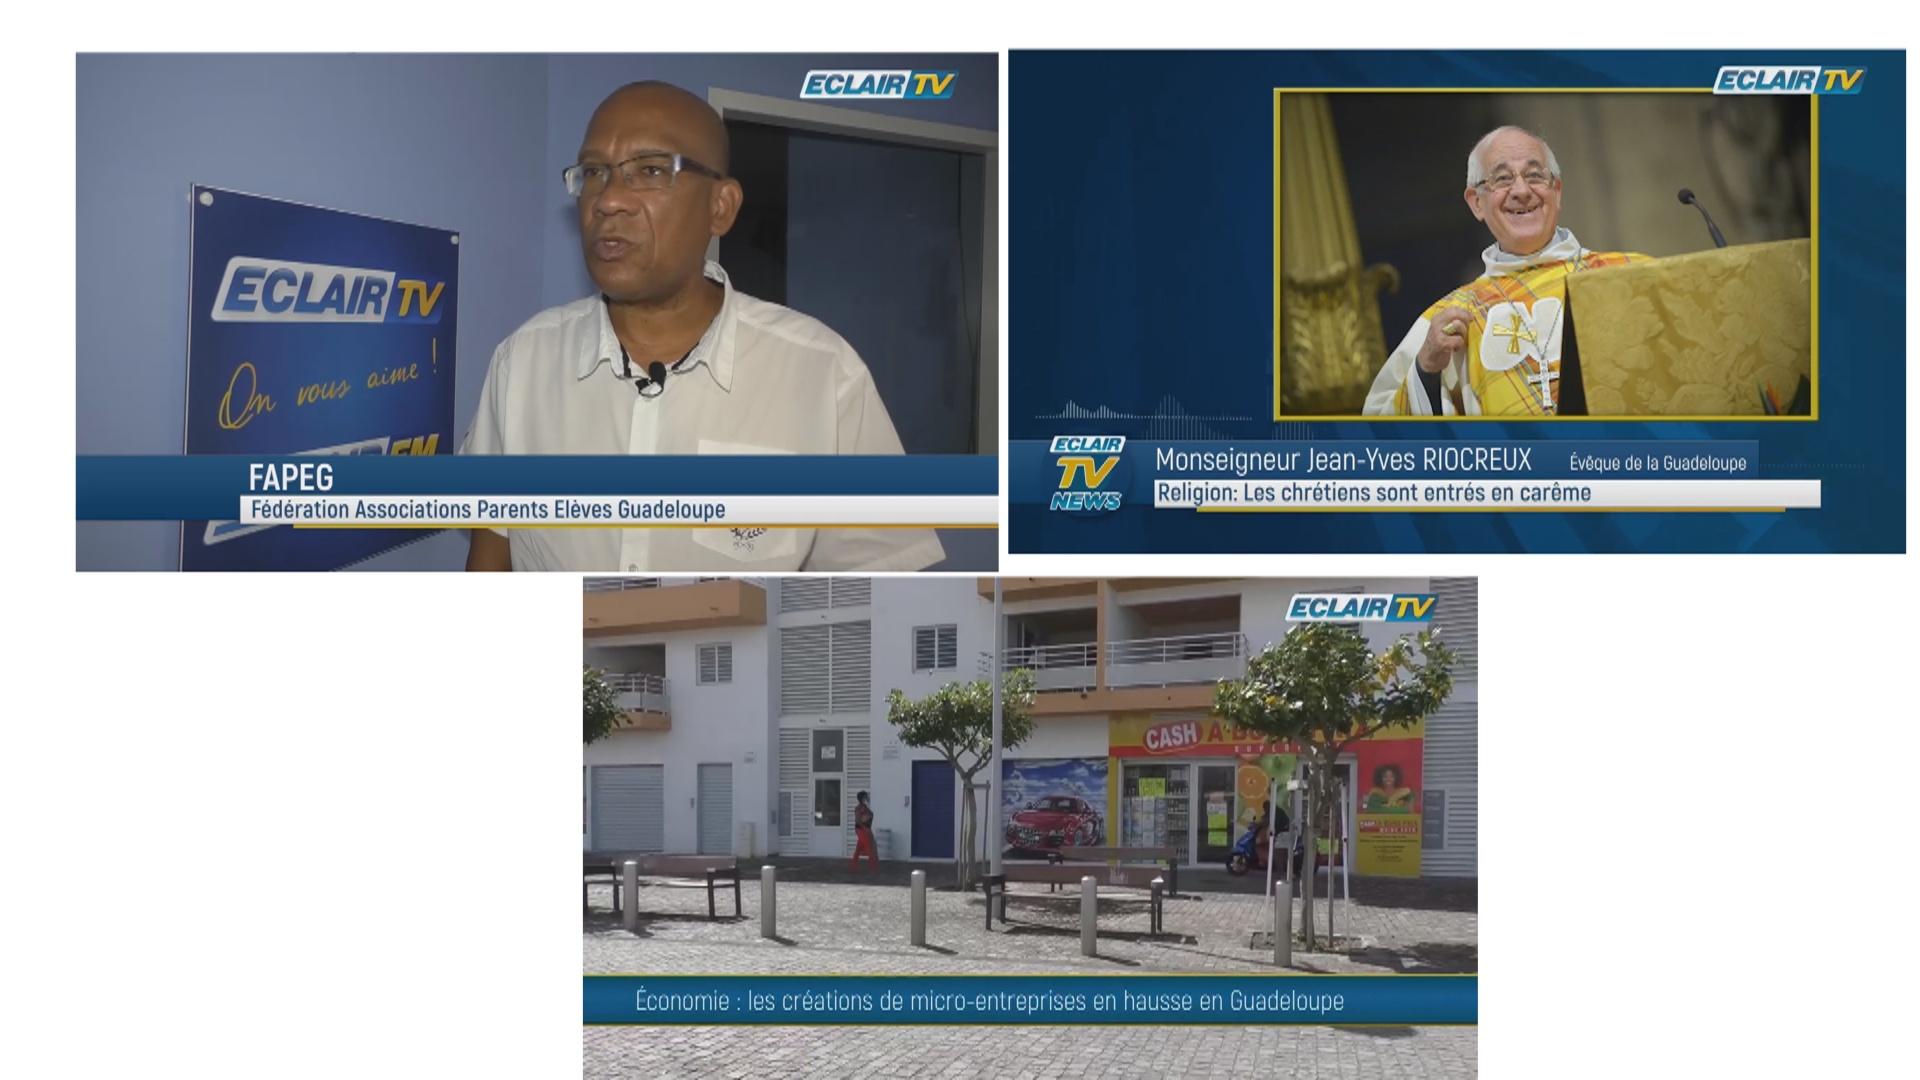 [Vidéo]  Onews Guadeloupe. Flash Infos (Eclair TV)